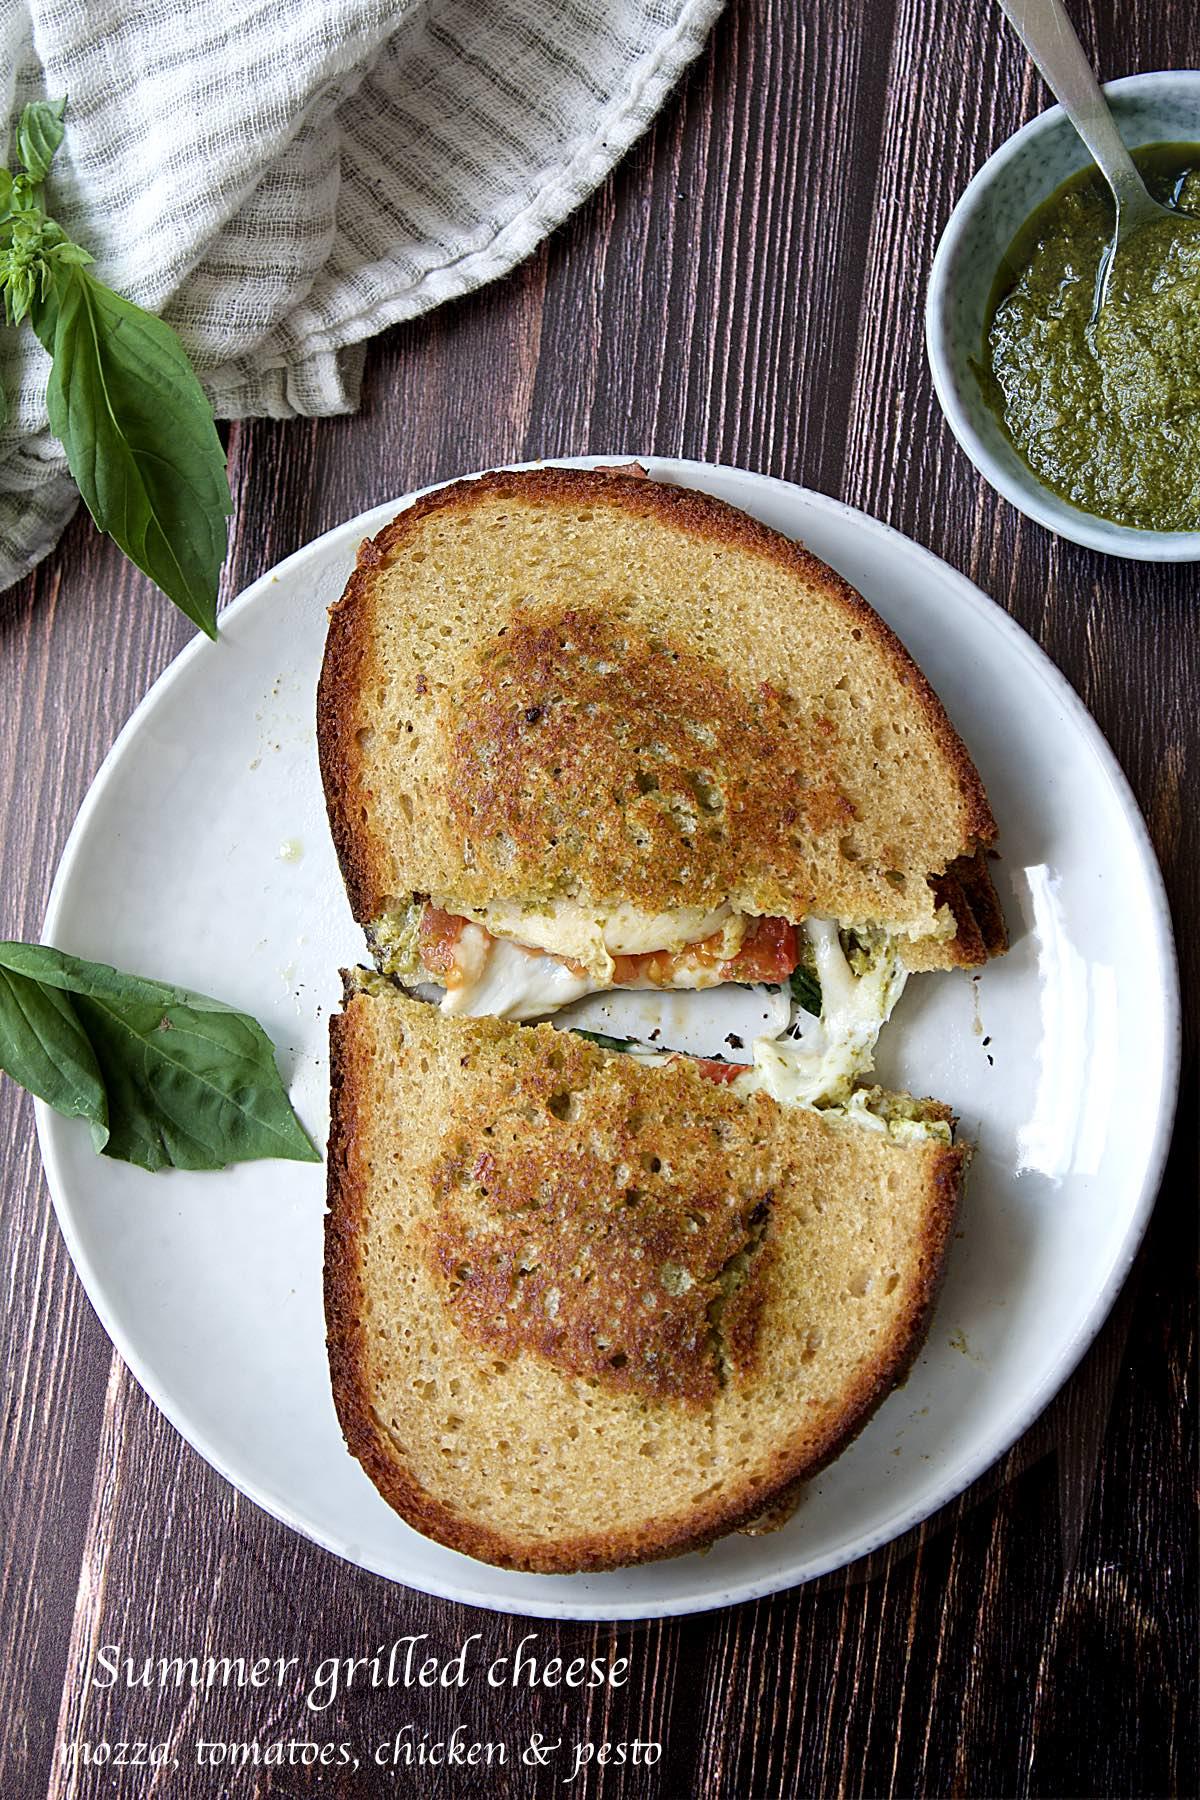 Summer grilled cheese : mozzarella, pesto, chicken & tomatoes